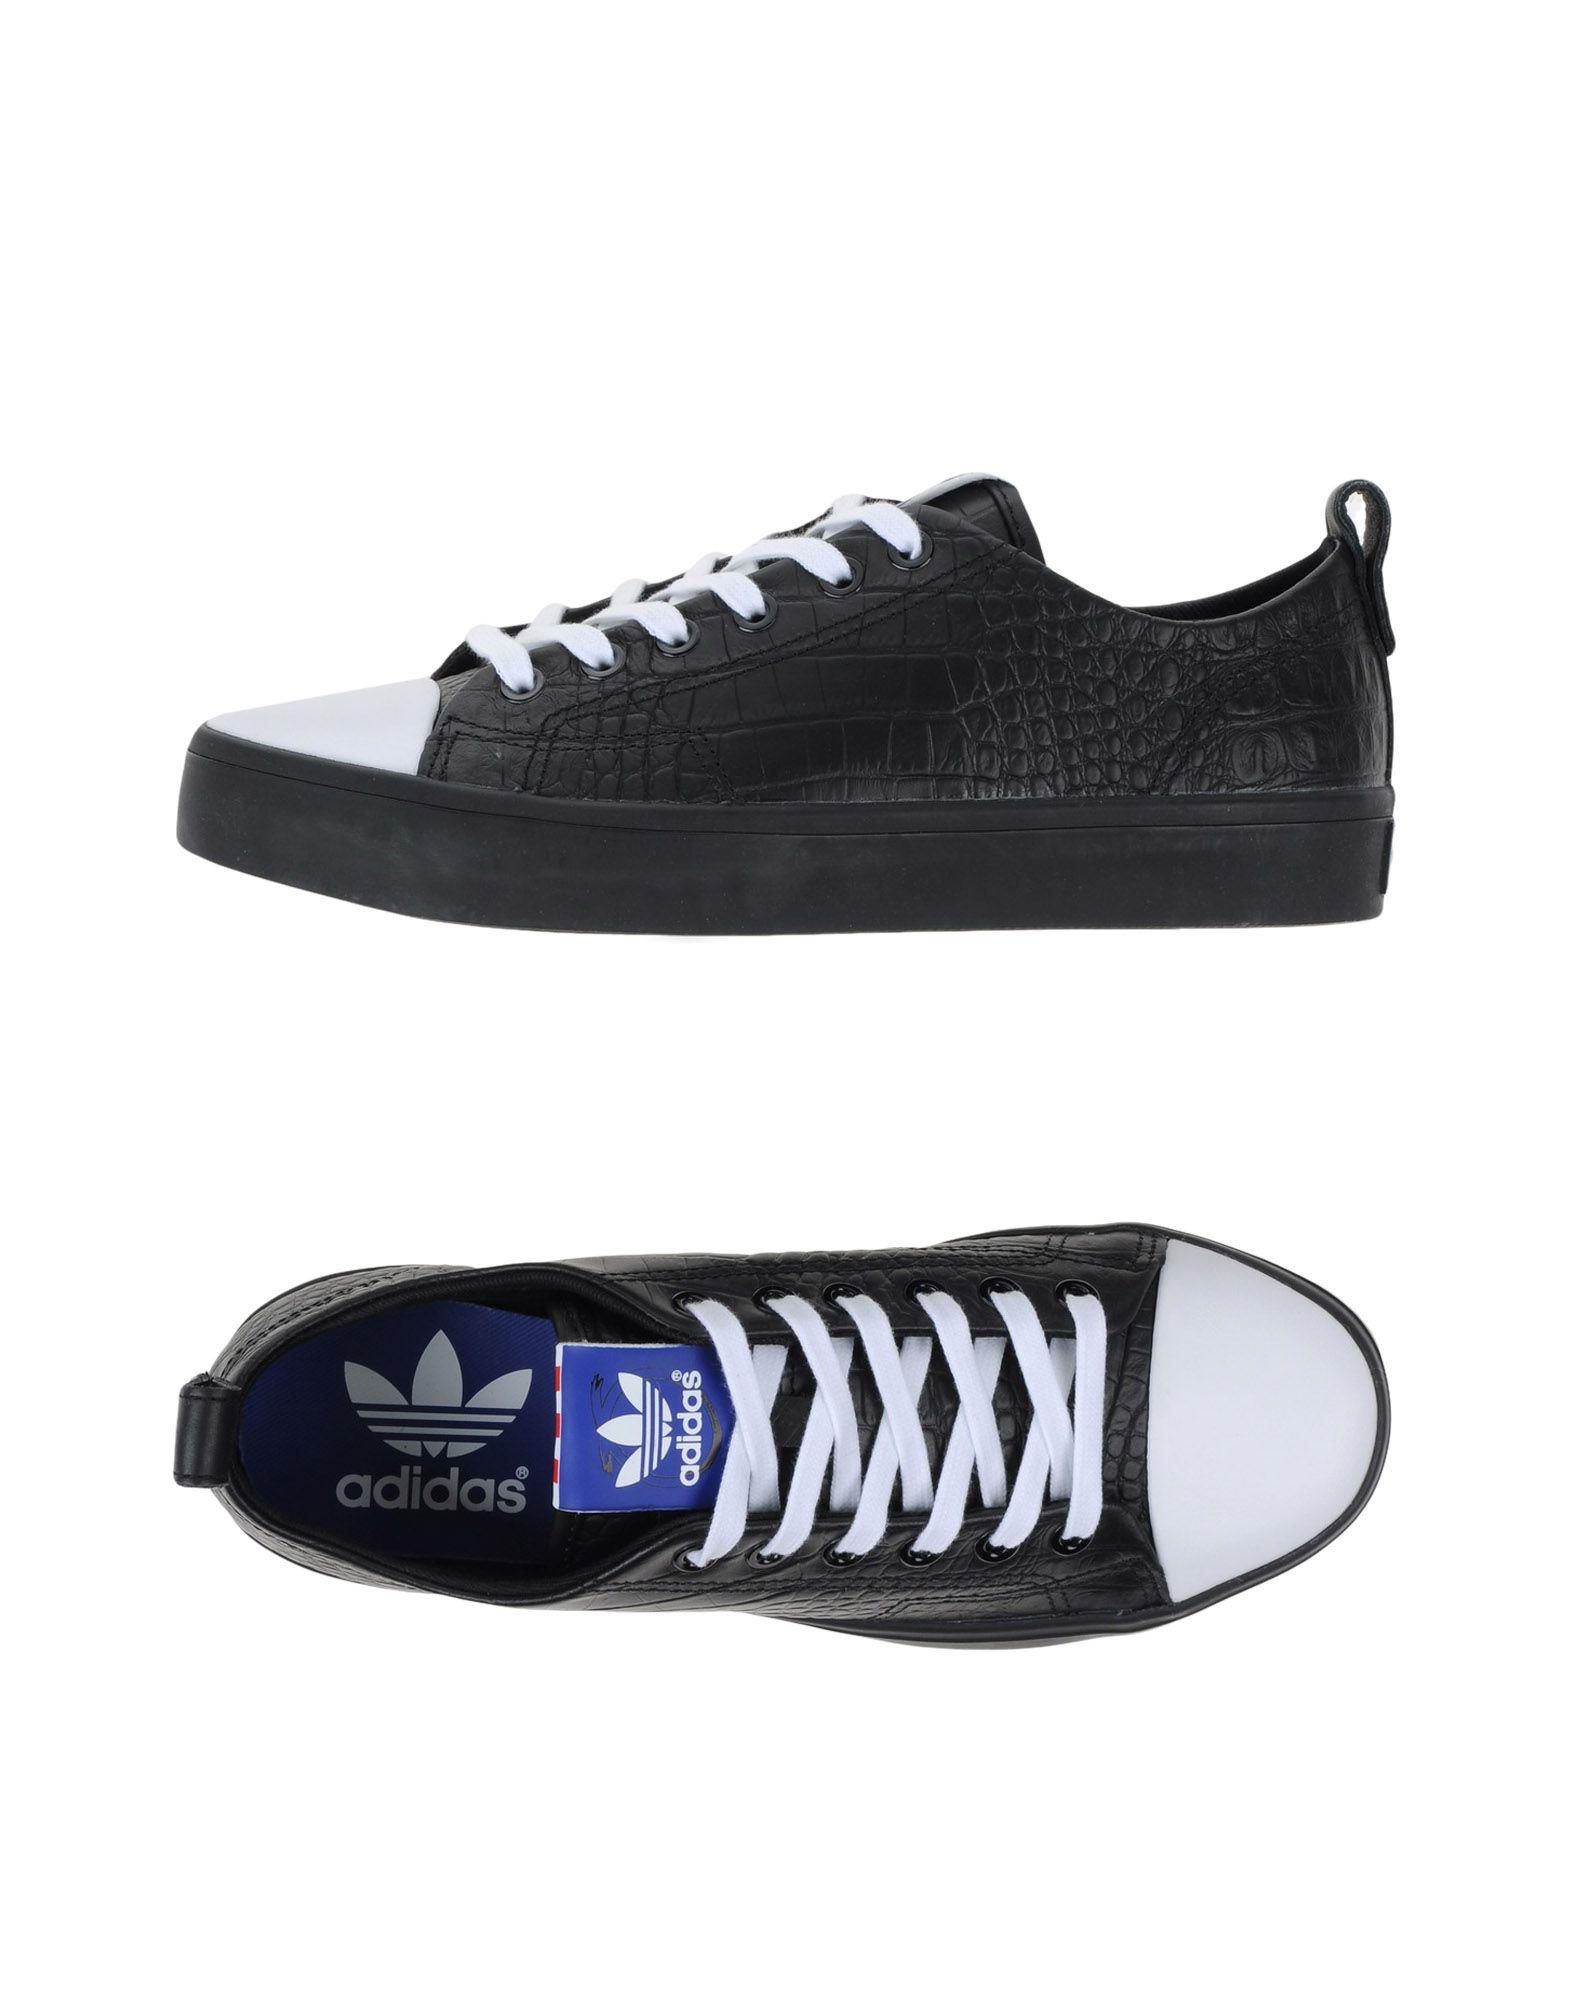 Sneakers Adidas Originals By Rita Ora Honey 2.0 Low - Donna - 44965197PK